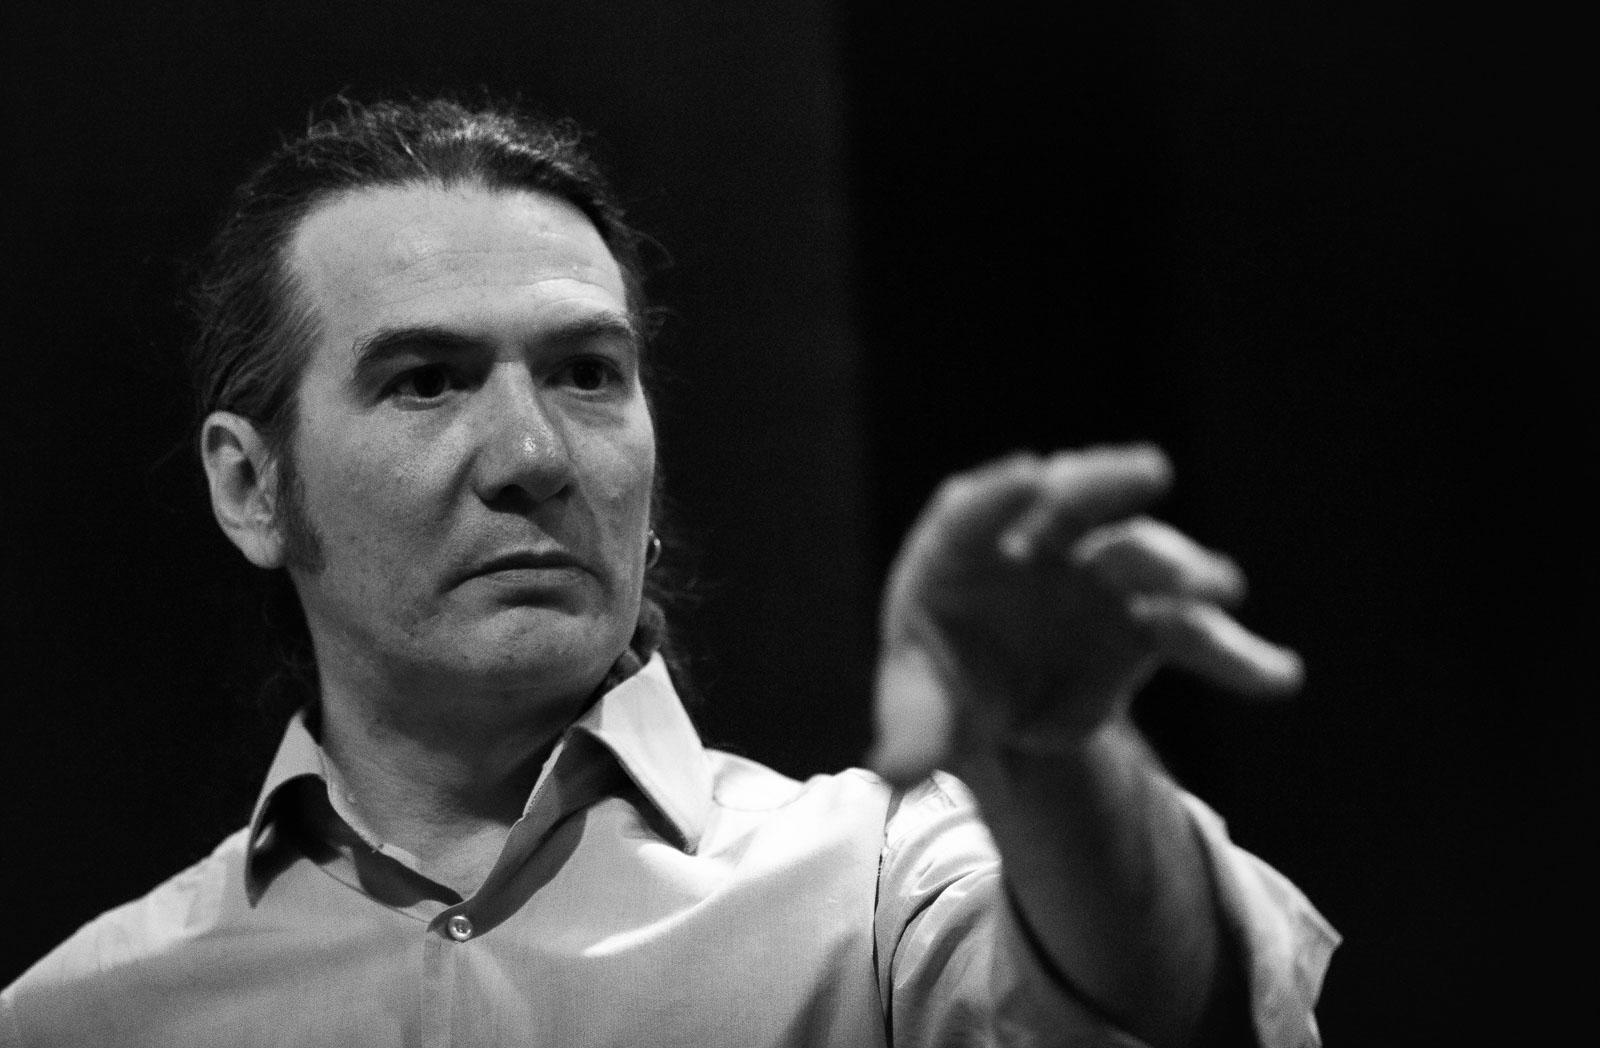 Francesco Kiais